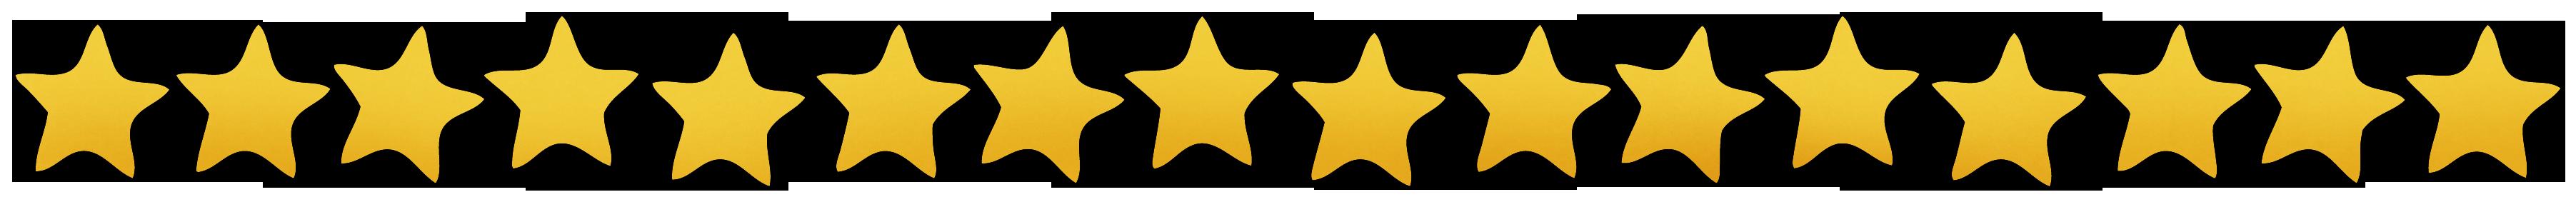 Star top border clipart vector library download An error occurred. vector library download